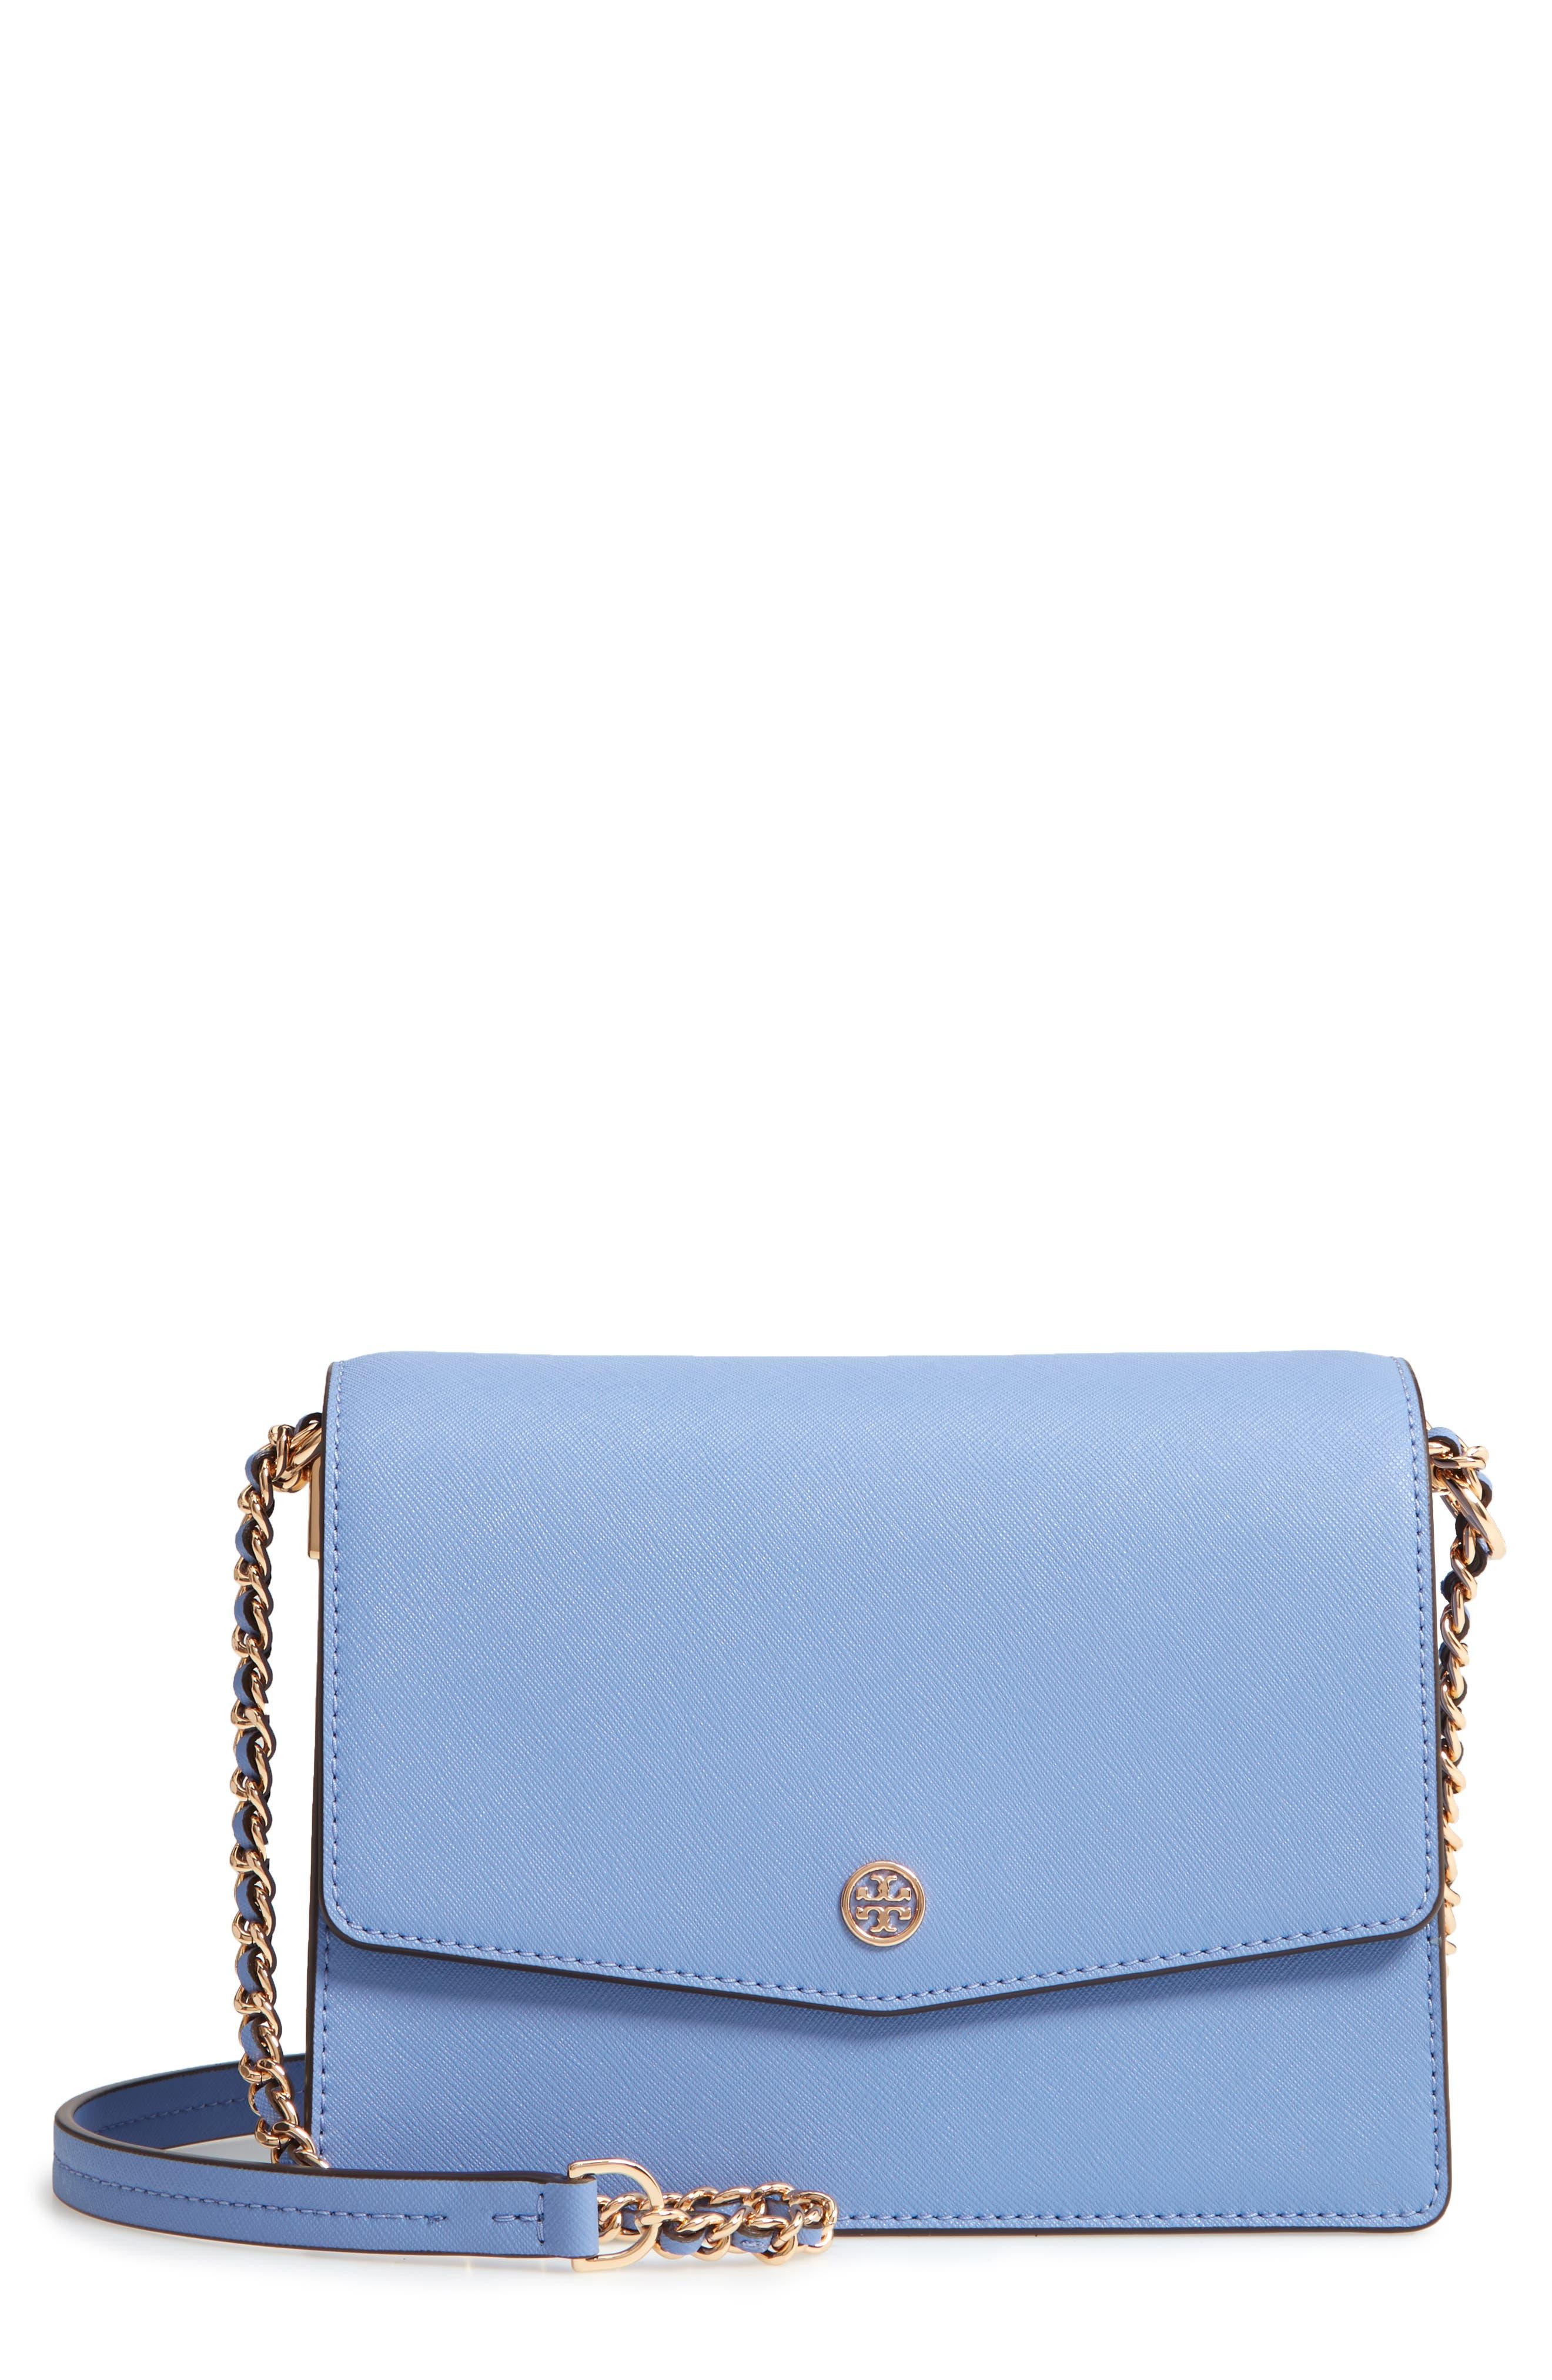 Robinson Convertible Leather Shoulder Bag,                             Main thumbnail 1, color,                             Bow Blue